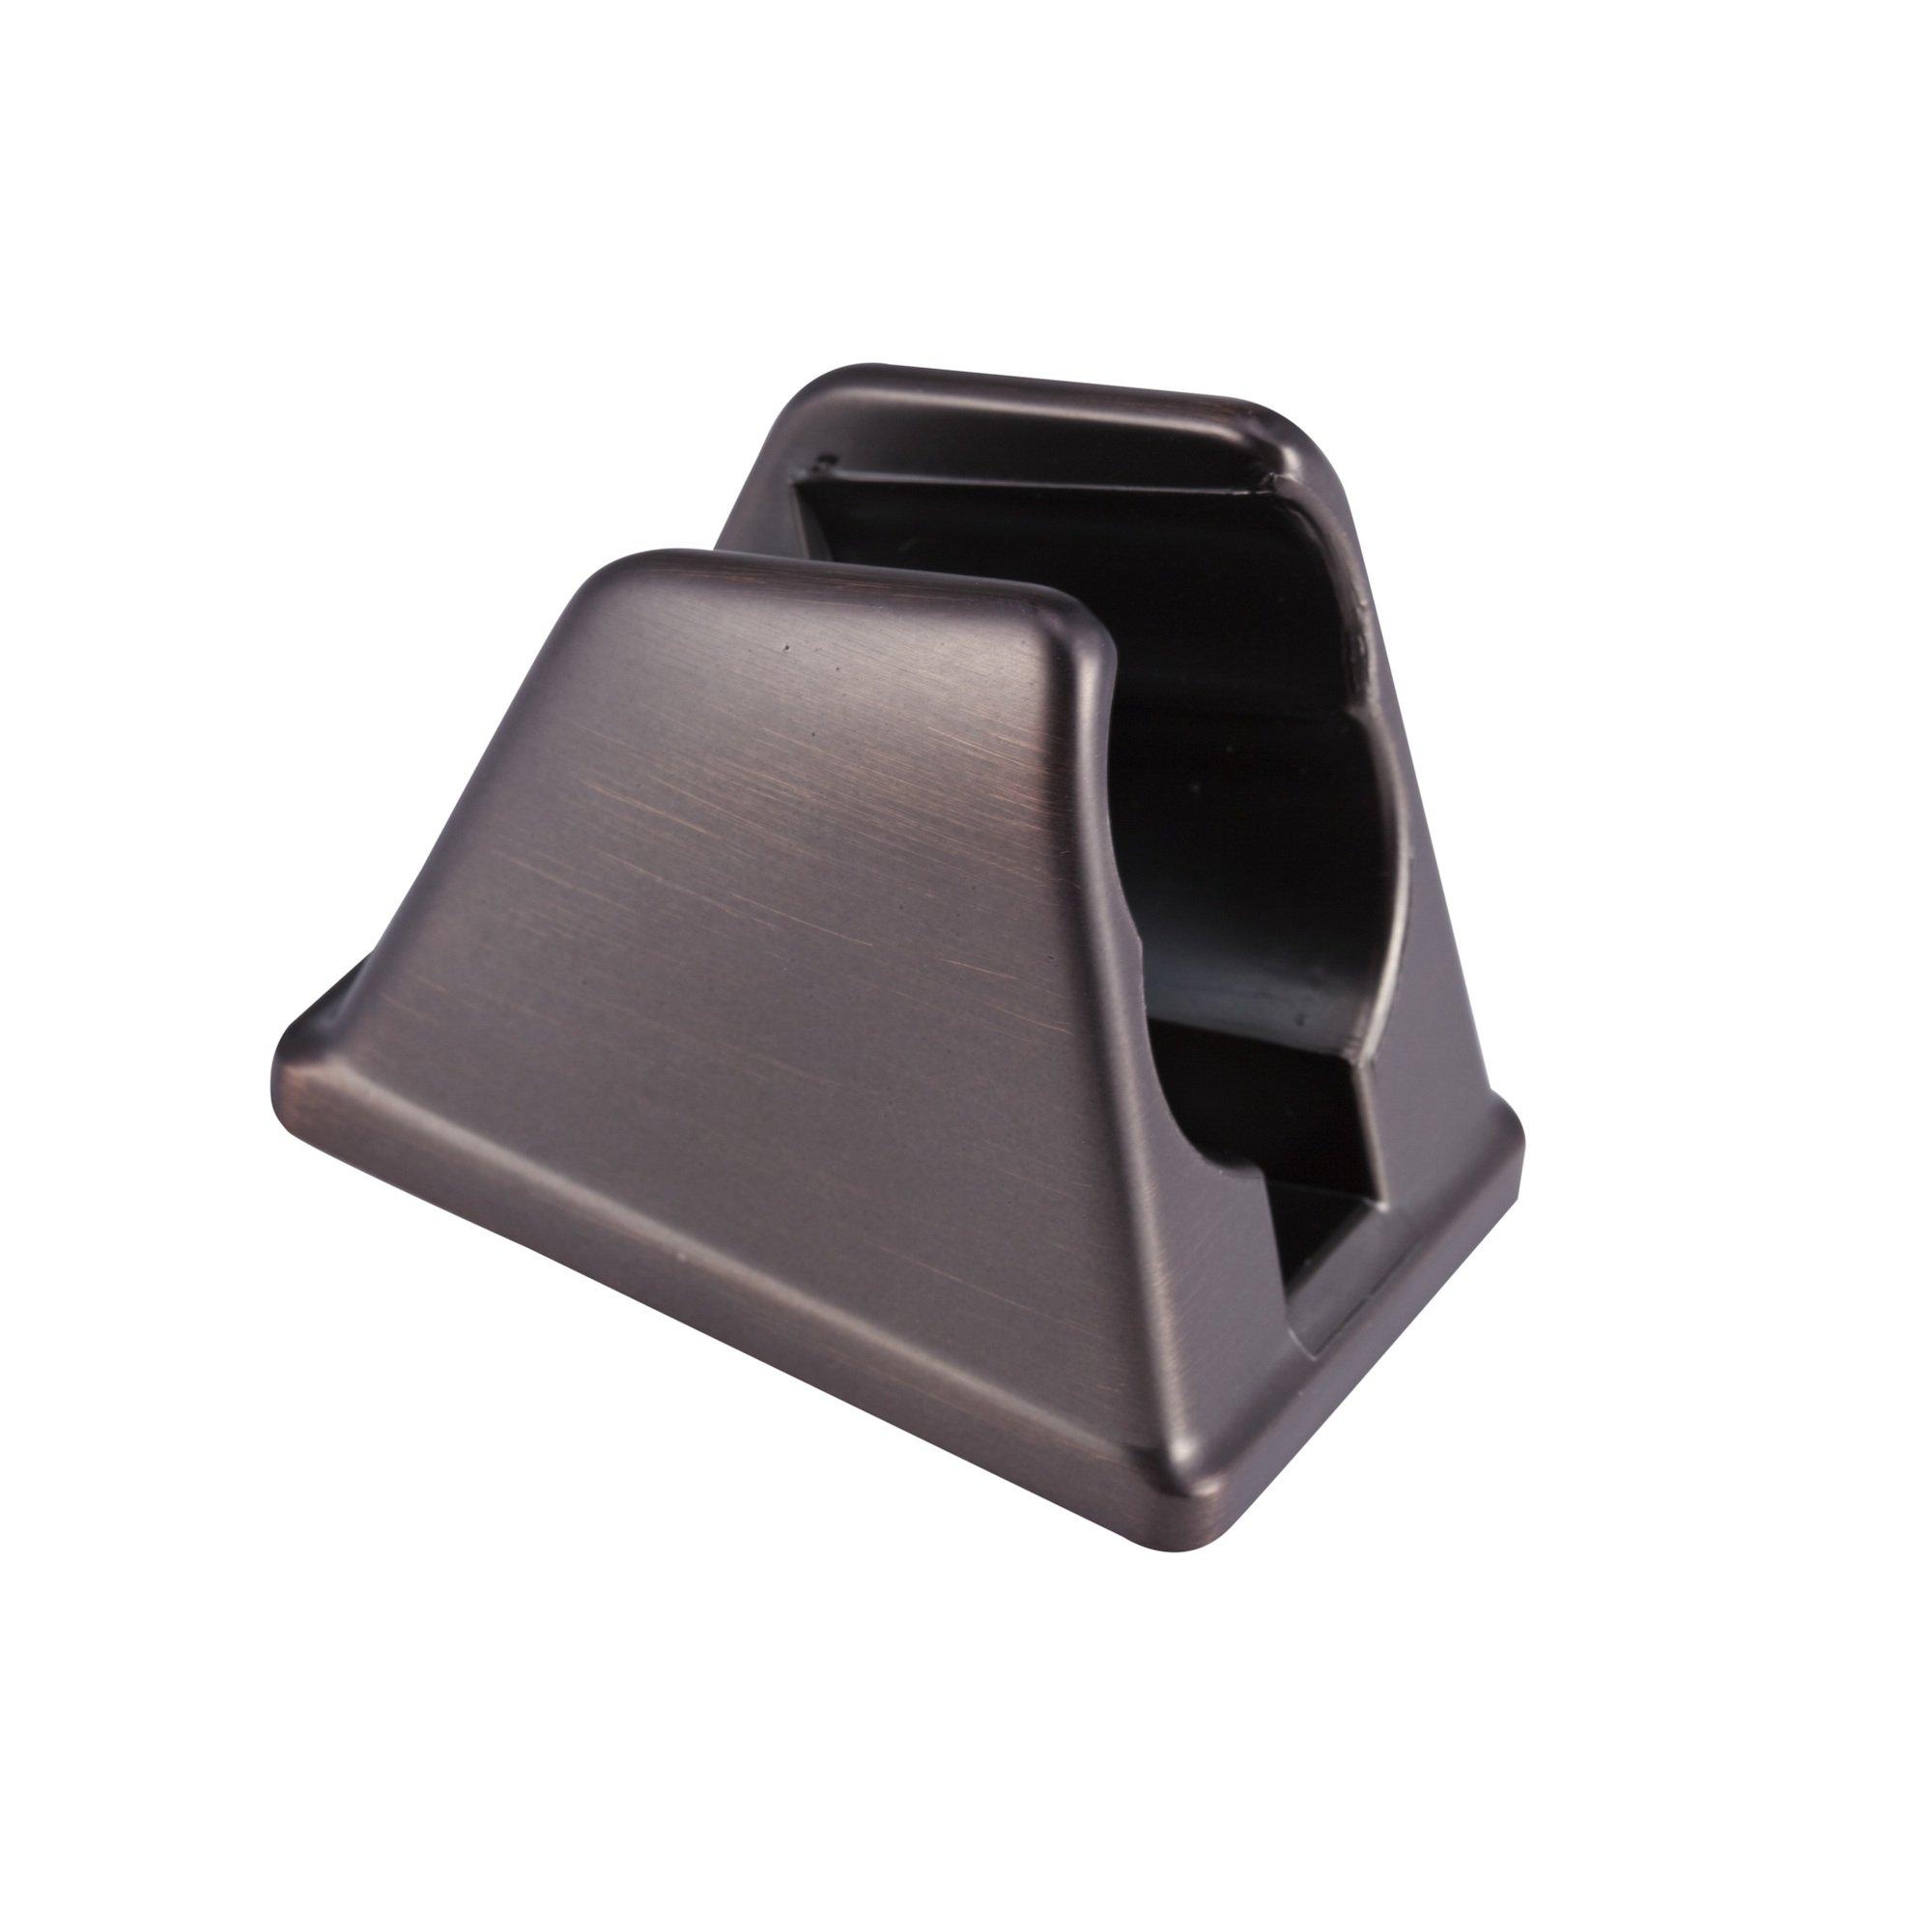 Dura Faucet DF-SA156-VB RV Handheld Shower Wand Bracket (Venetian Bronze)